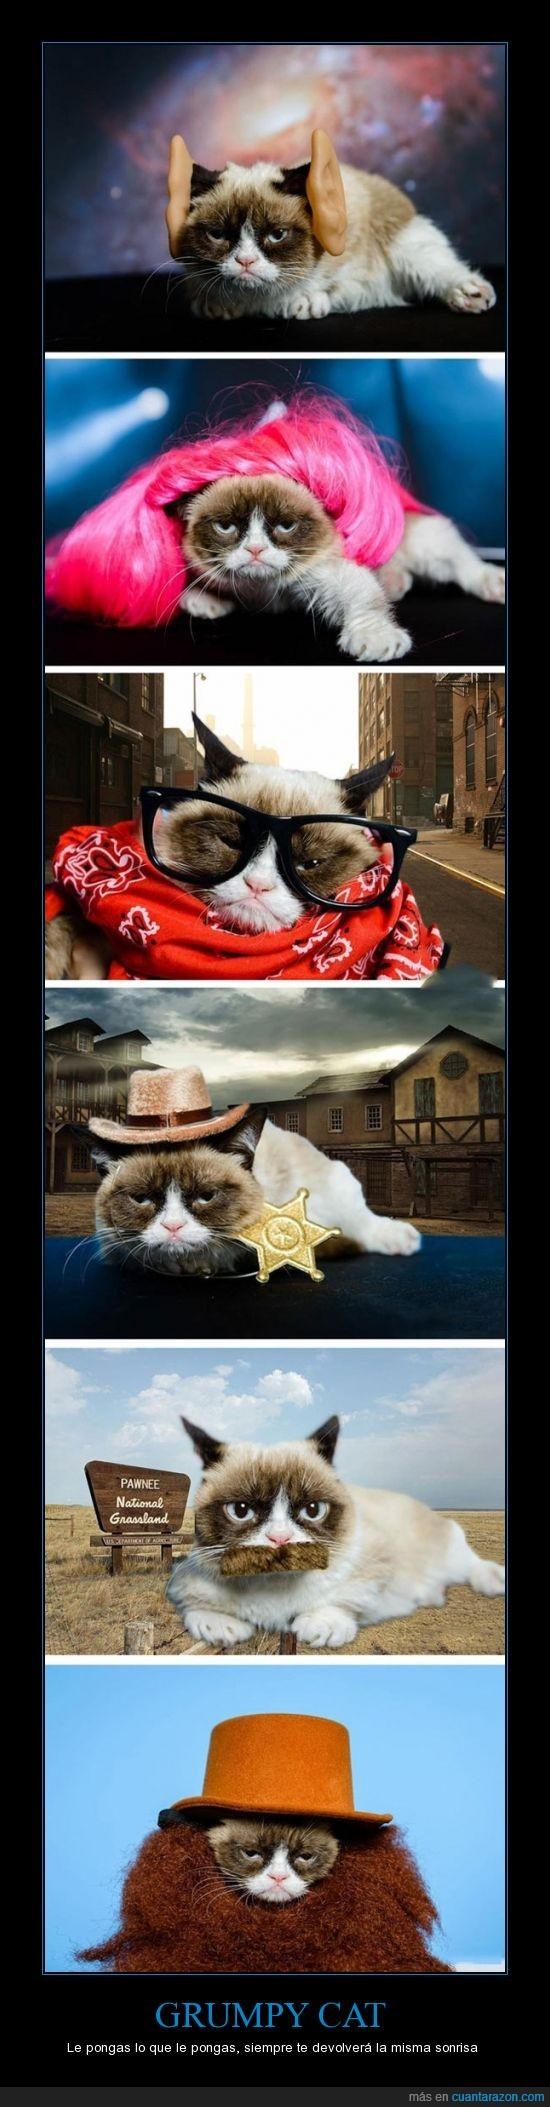 disfraces,grumpy cat,mala hostia